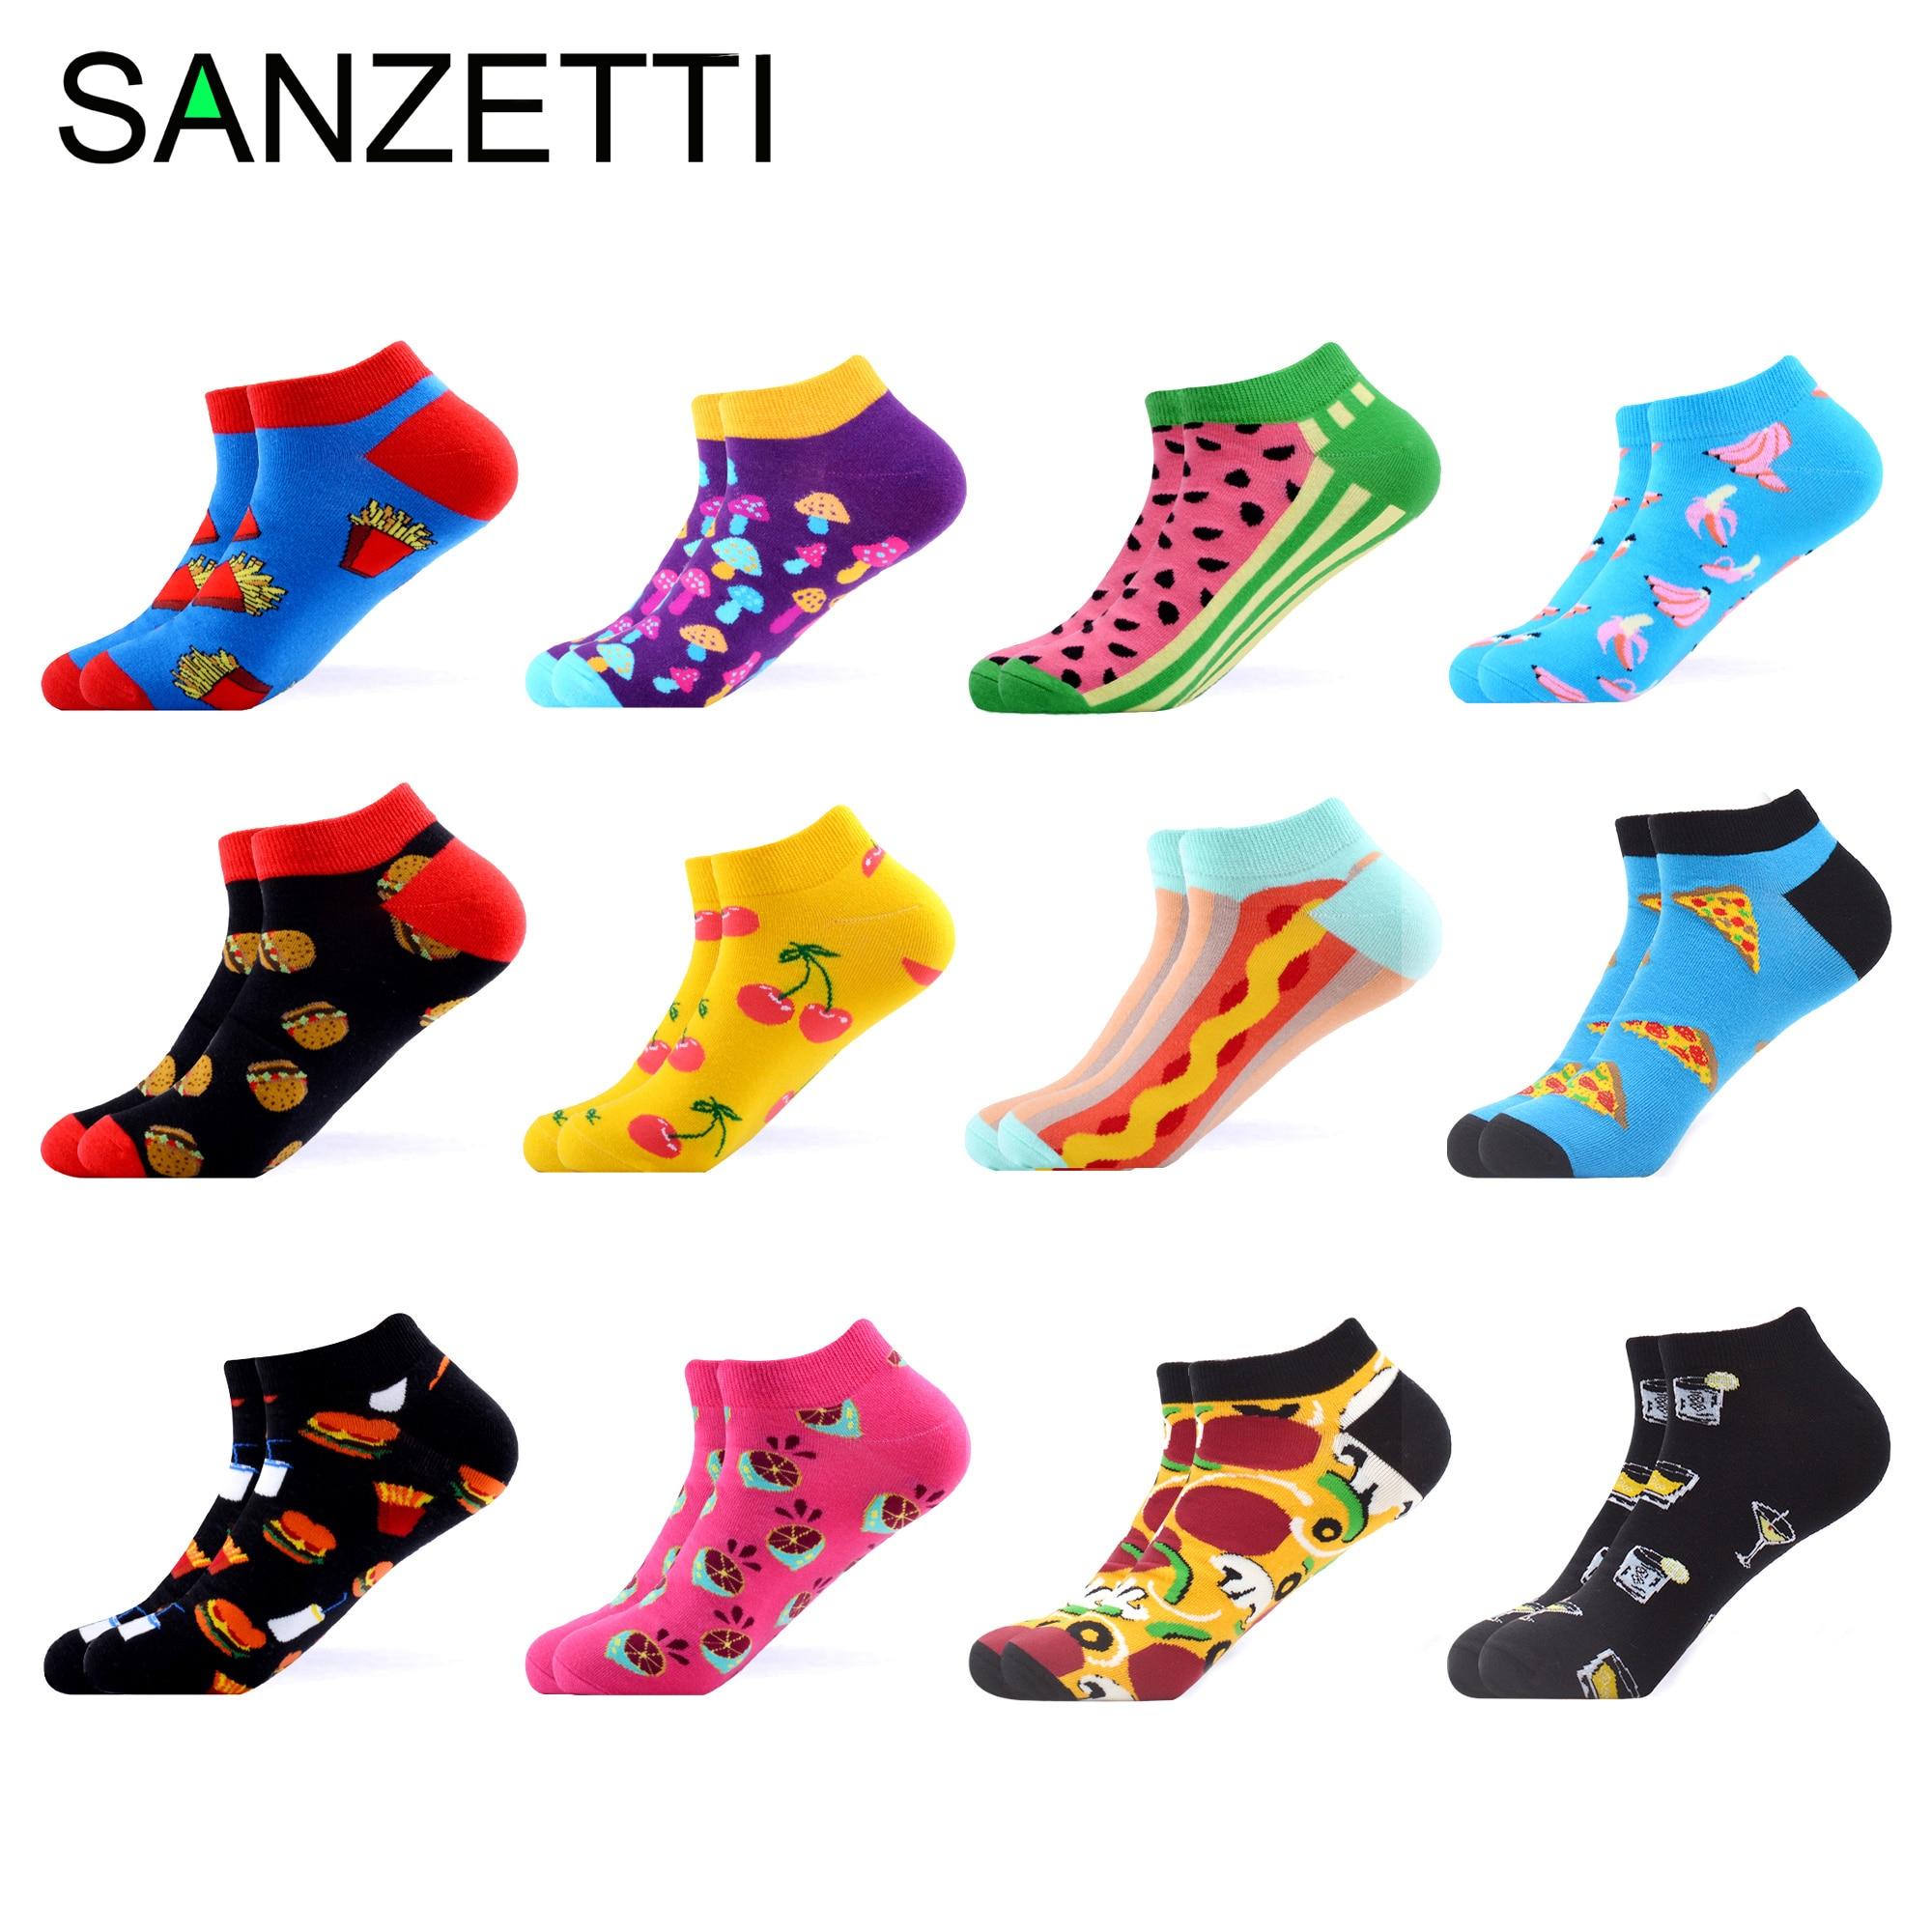 SANZETTI 12 Pairs/Lot Summer Women Casual Novelty Colorful Combed Cotton Ankle Socks Harajuku Happy Short Socks Plaid Tend SocksSocks   -